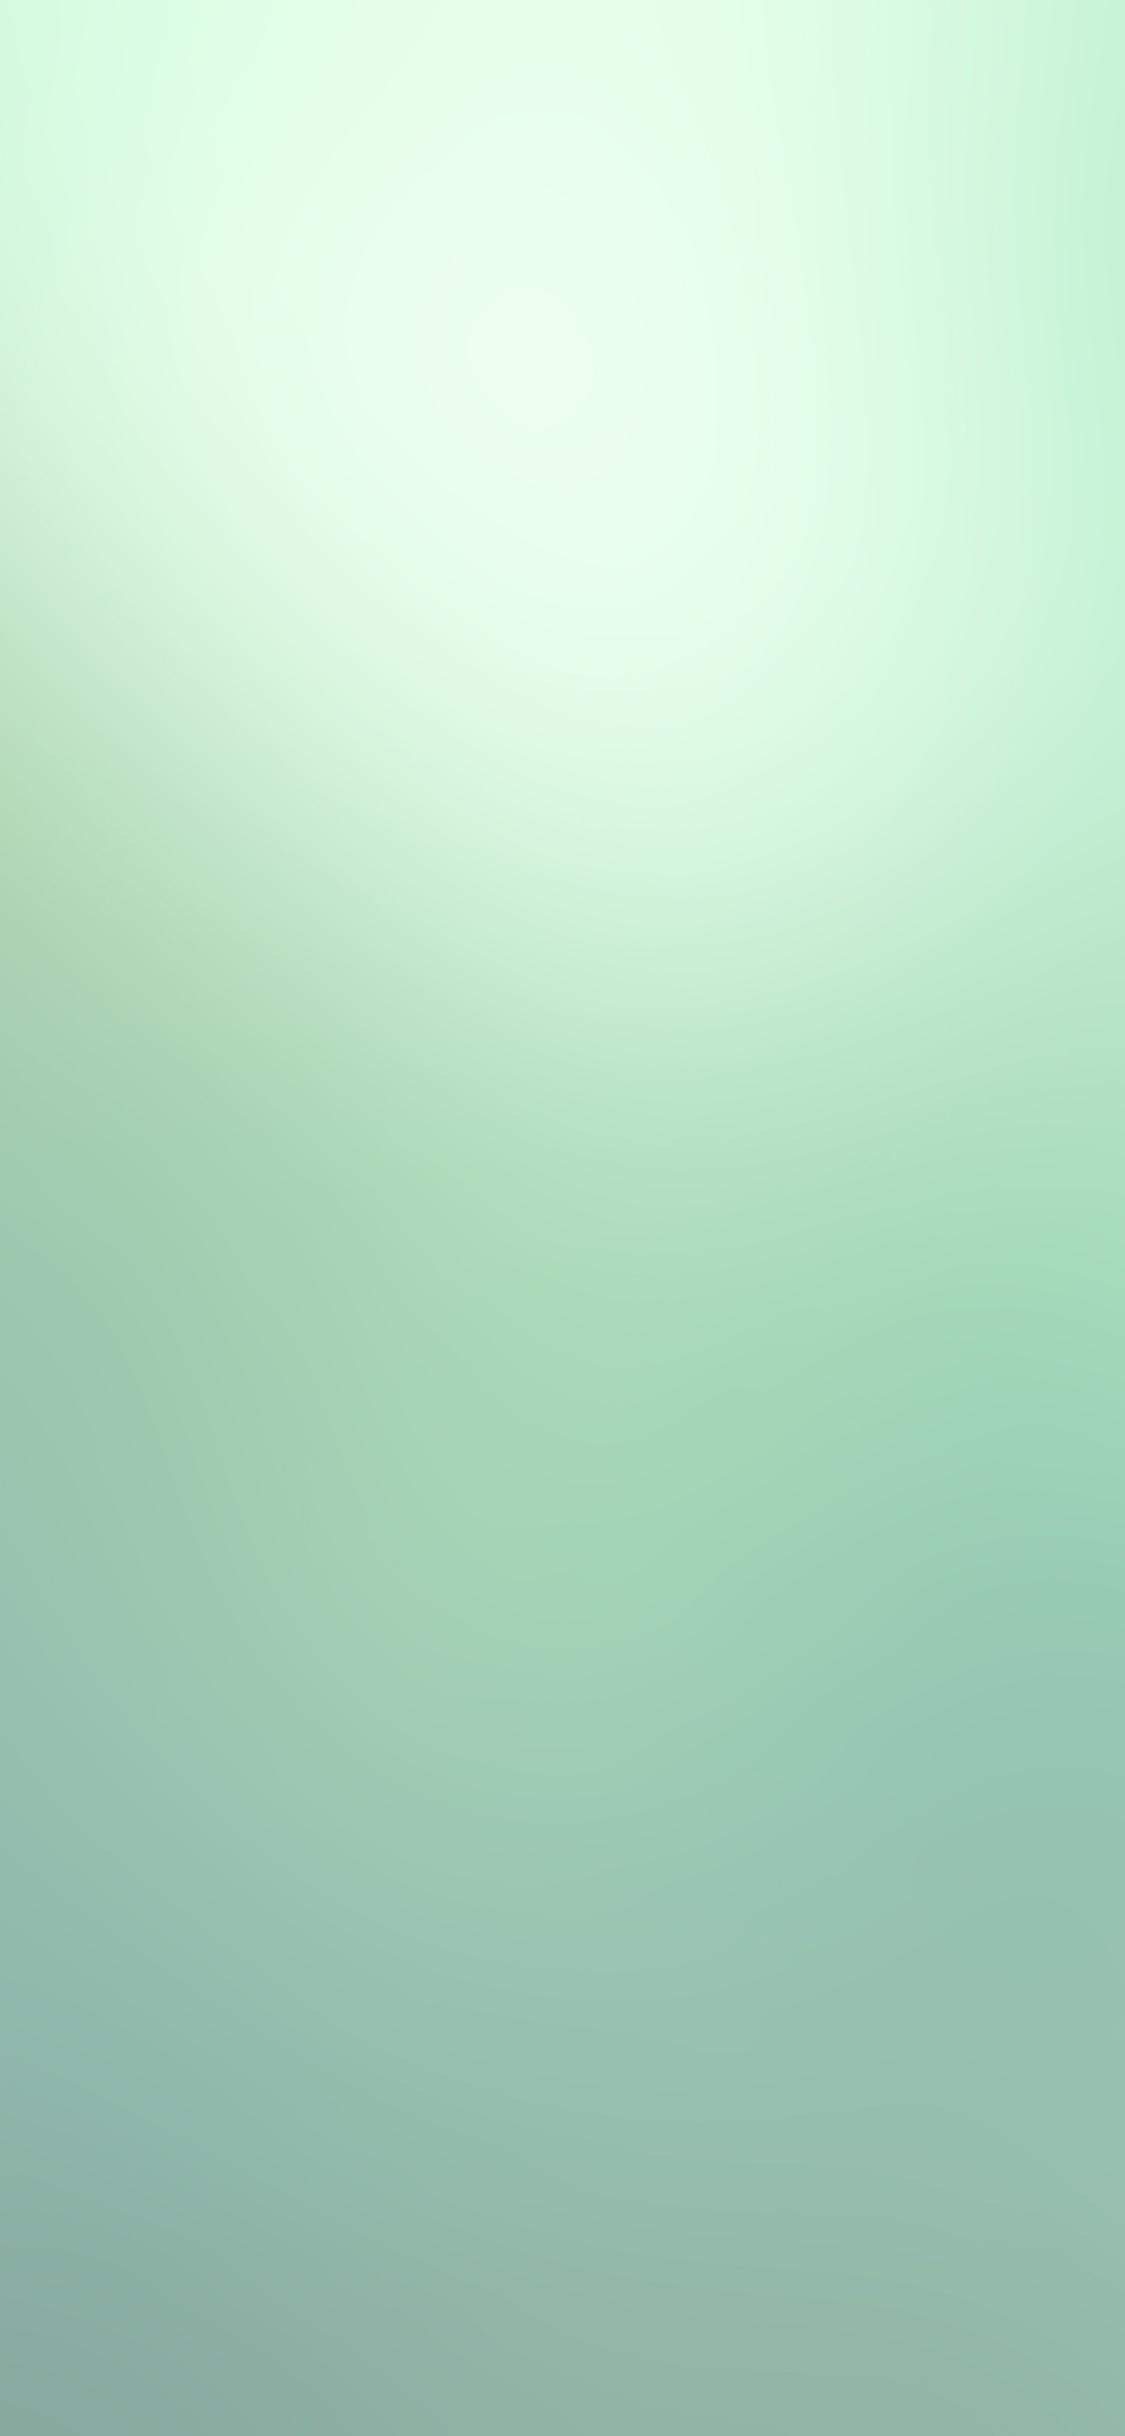 iPhoneXpapers.com-Apple-iPhone-wallpaper-sd35-green-olive-leaf-gradation-blur